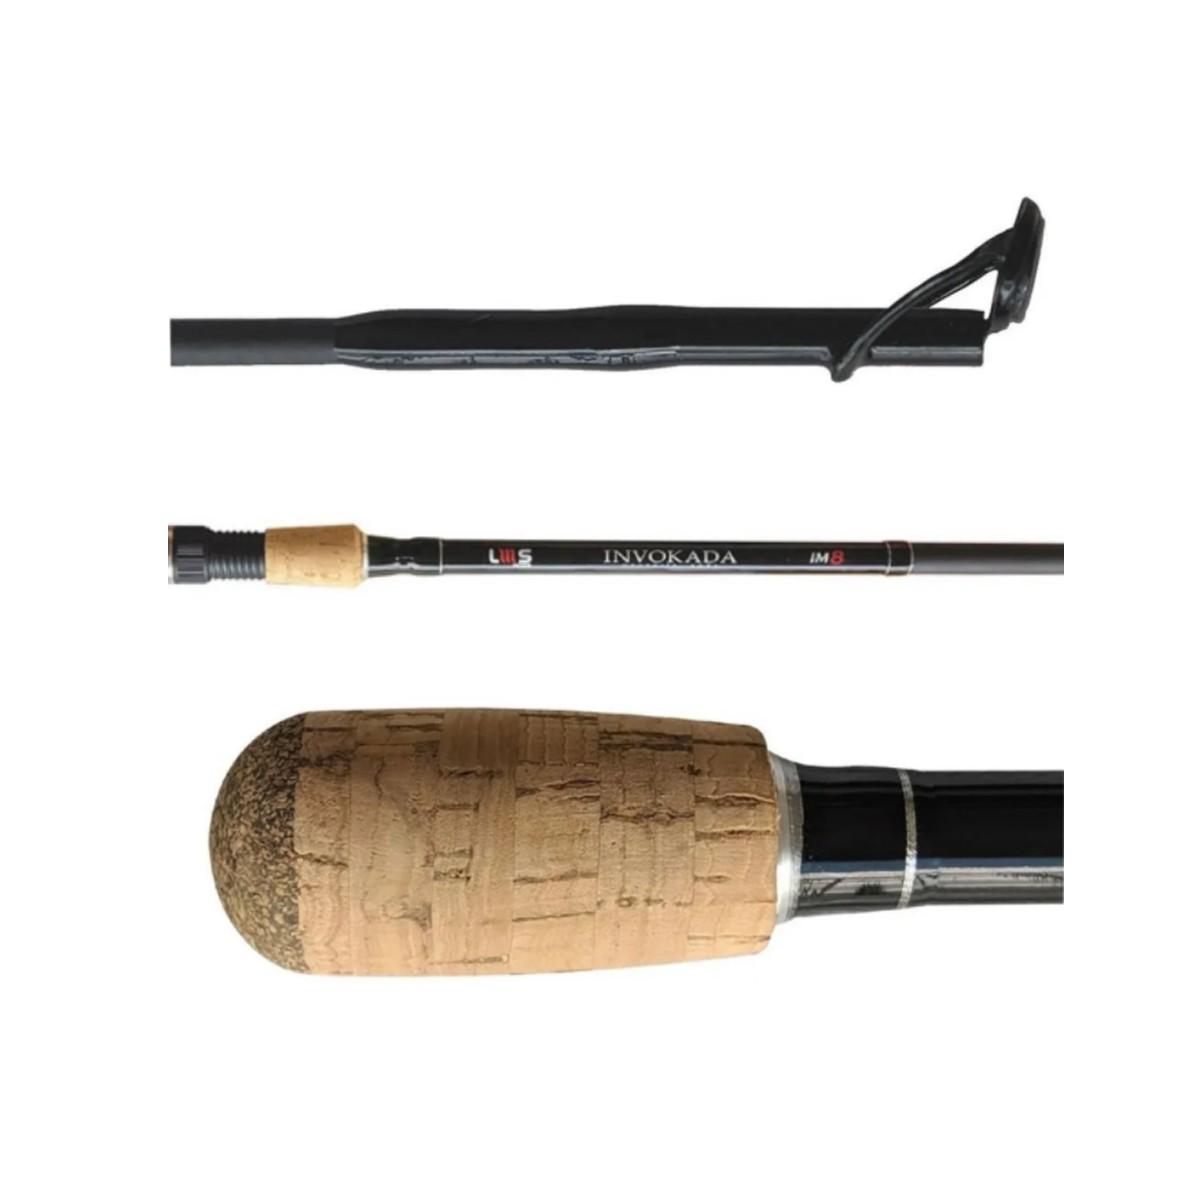 Vara Lumis Invokada p/ Carretilha 2,70 m 50 lbs (2 partes)  - Pró Pesca Shop